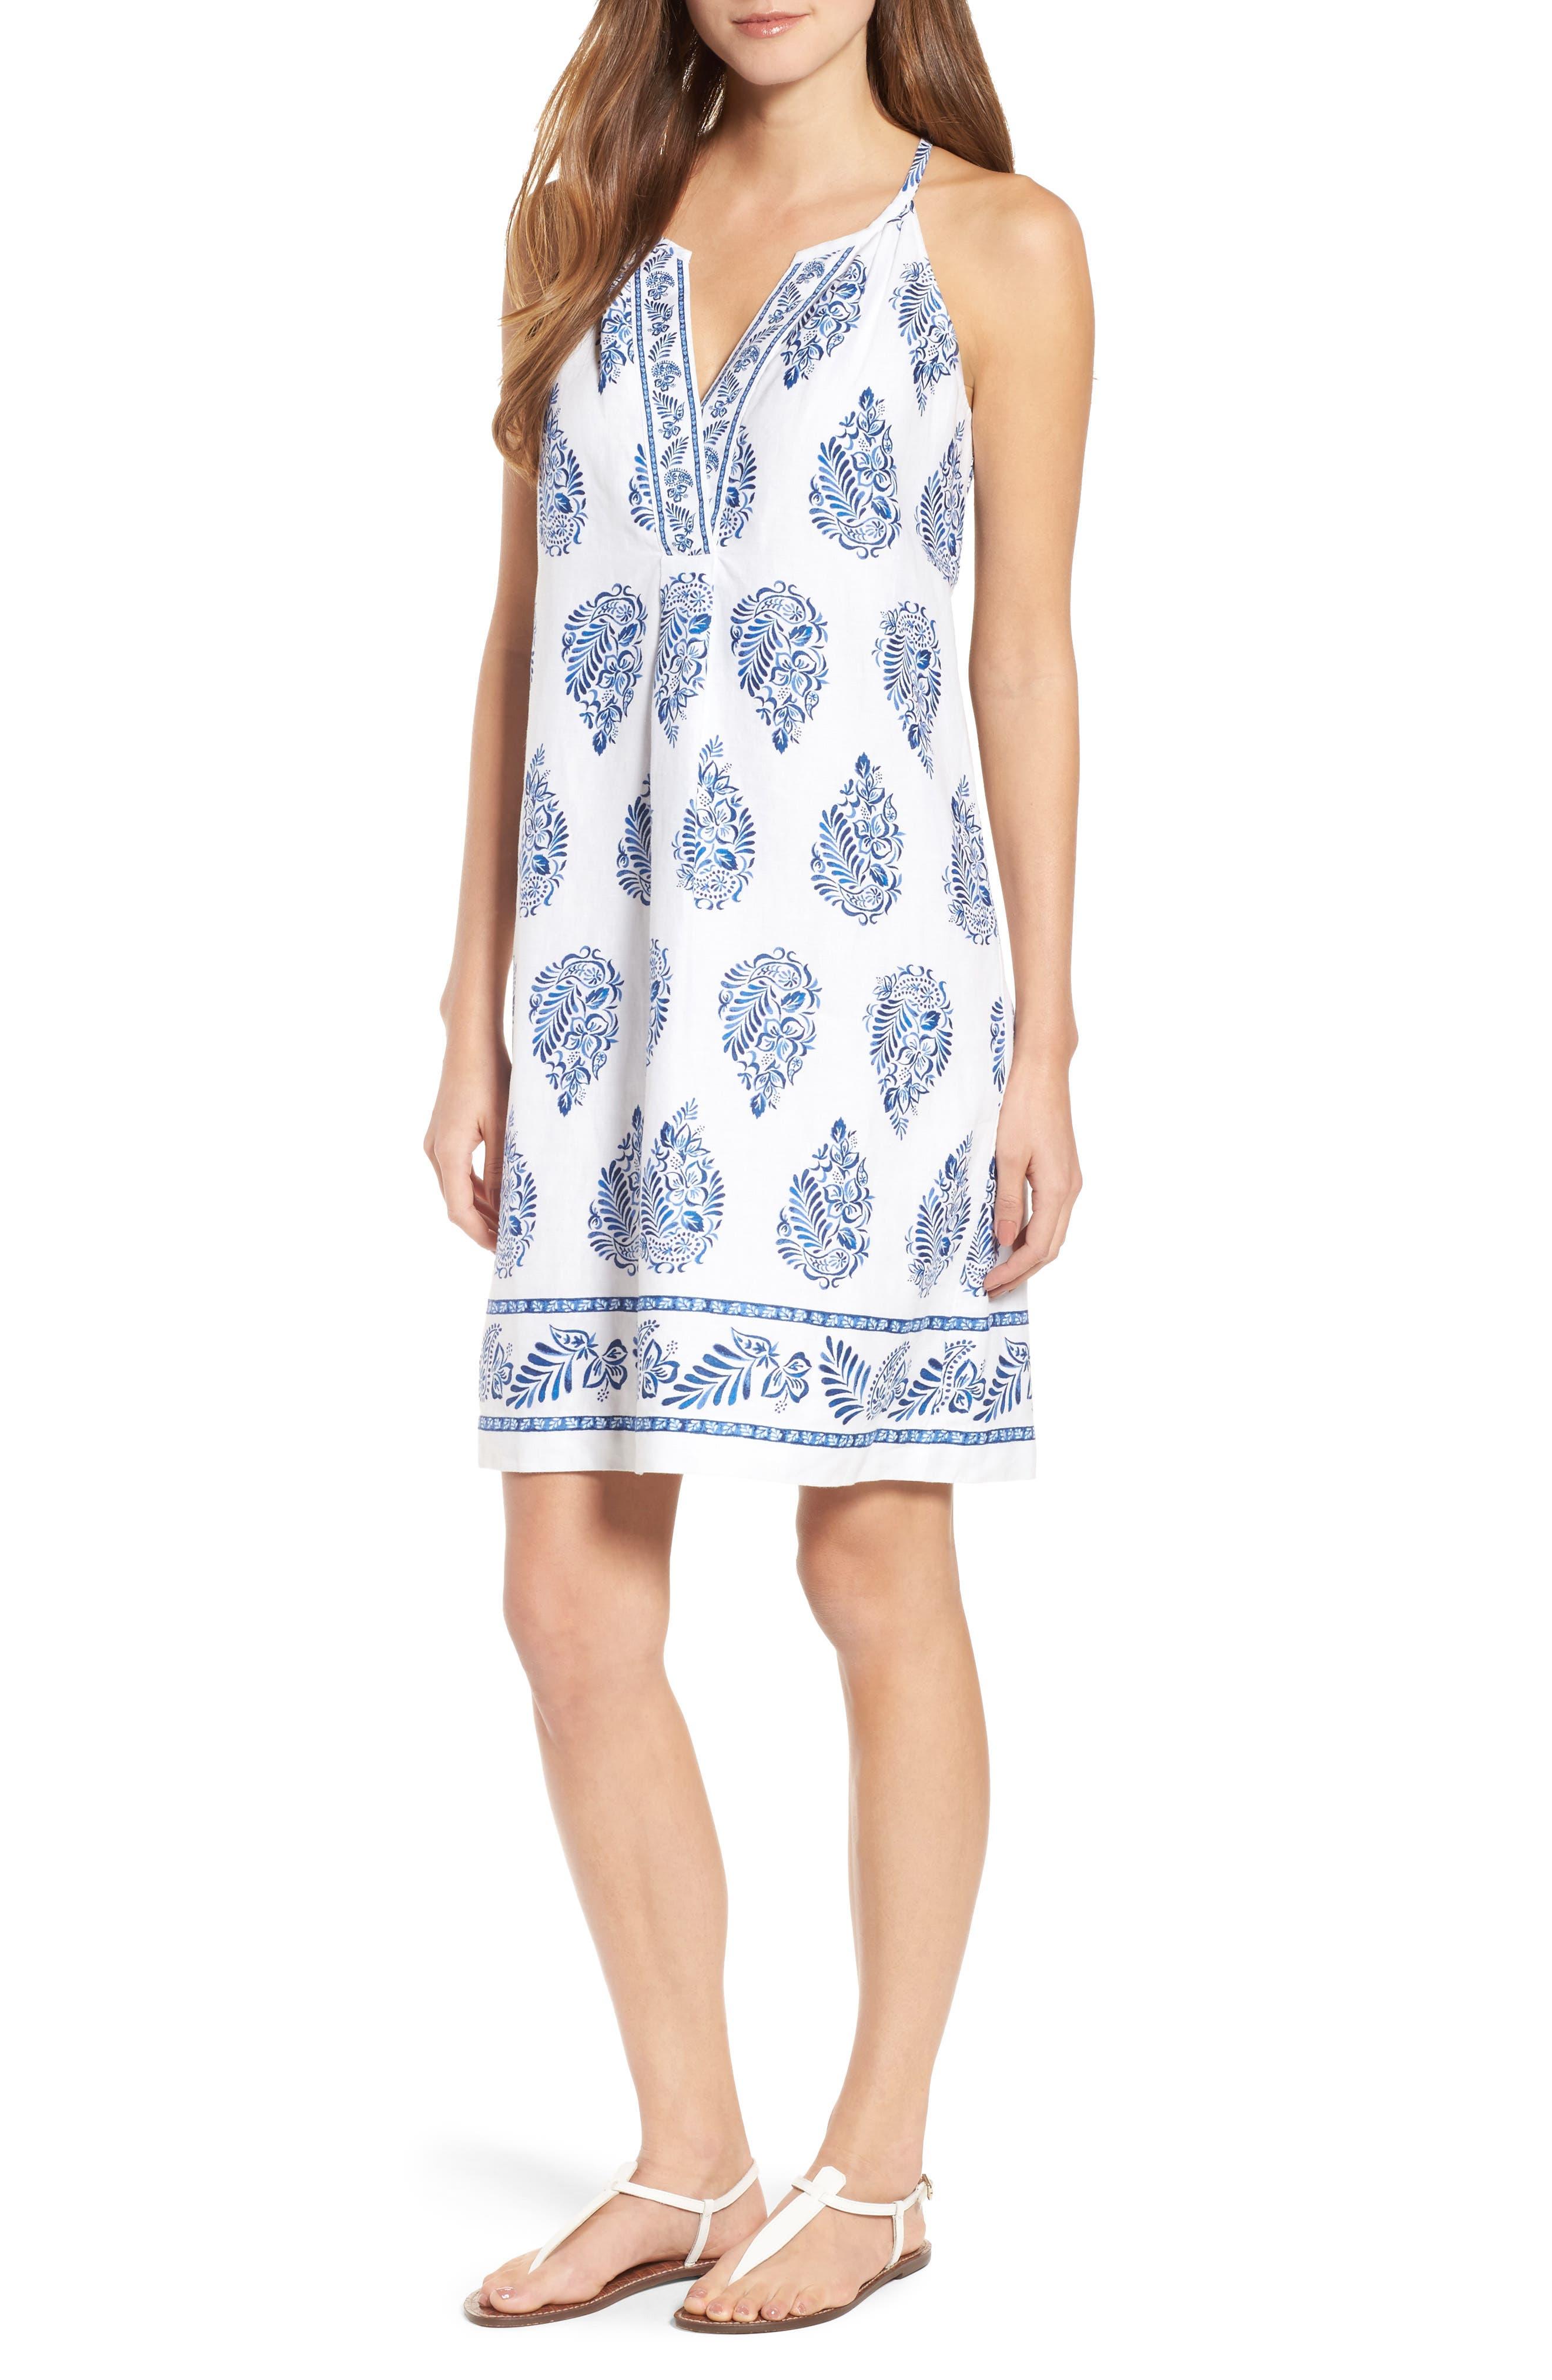 Paleys Paisley Sleeveless Shift Dress,                             Main thumbnail 1, color,                             Cobalt